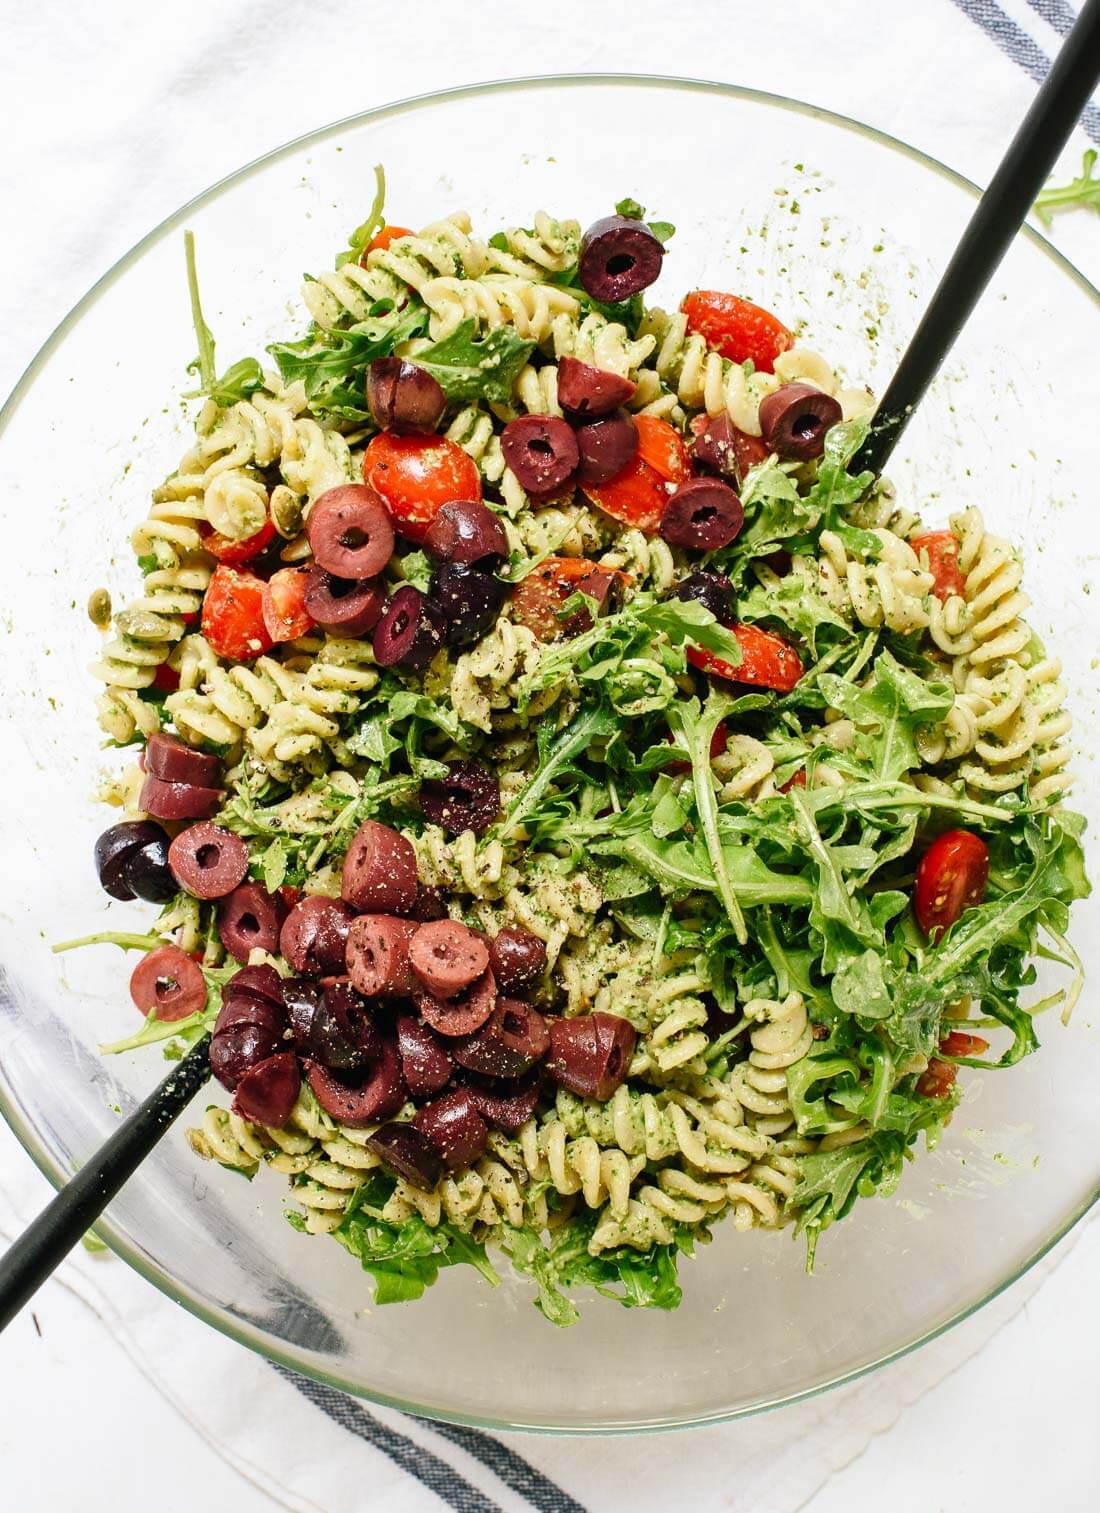 Healthy Pesto Pasta Salad Recipe  Pesto Pasta Salad Recipe Cookie and Kate